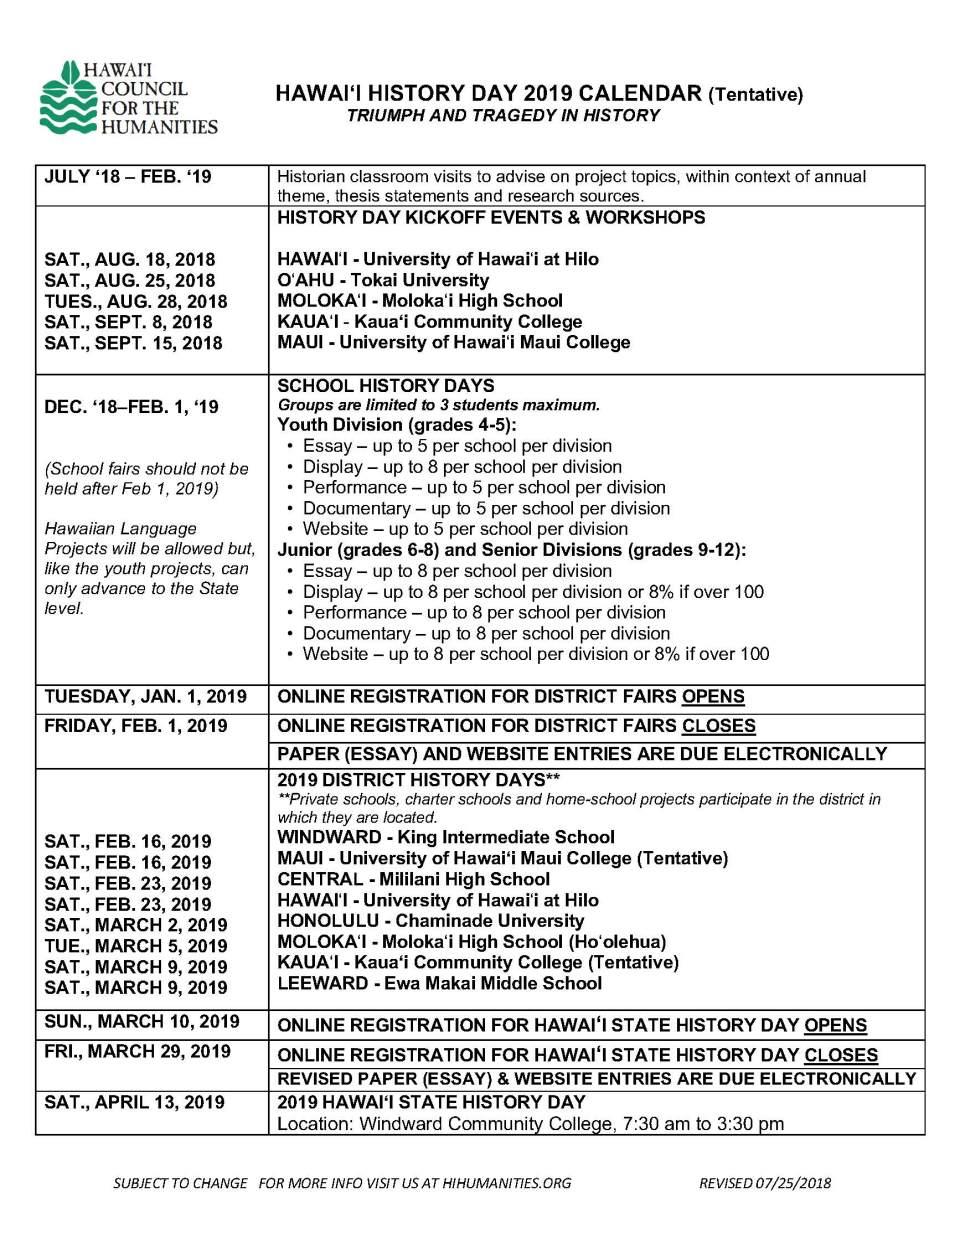 HHD Calendar 2018-2019